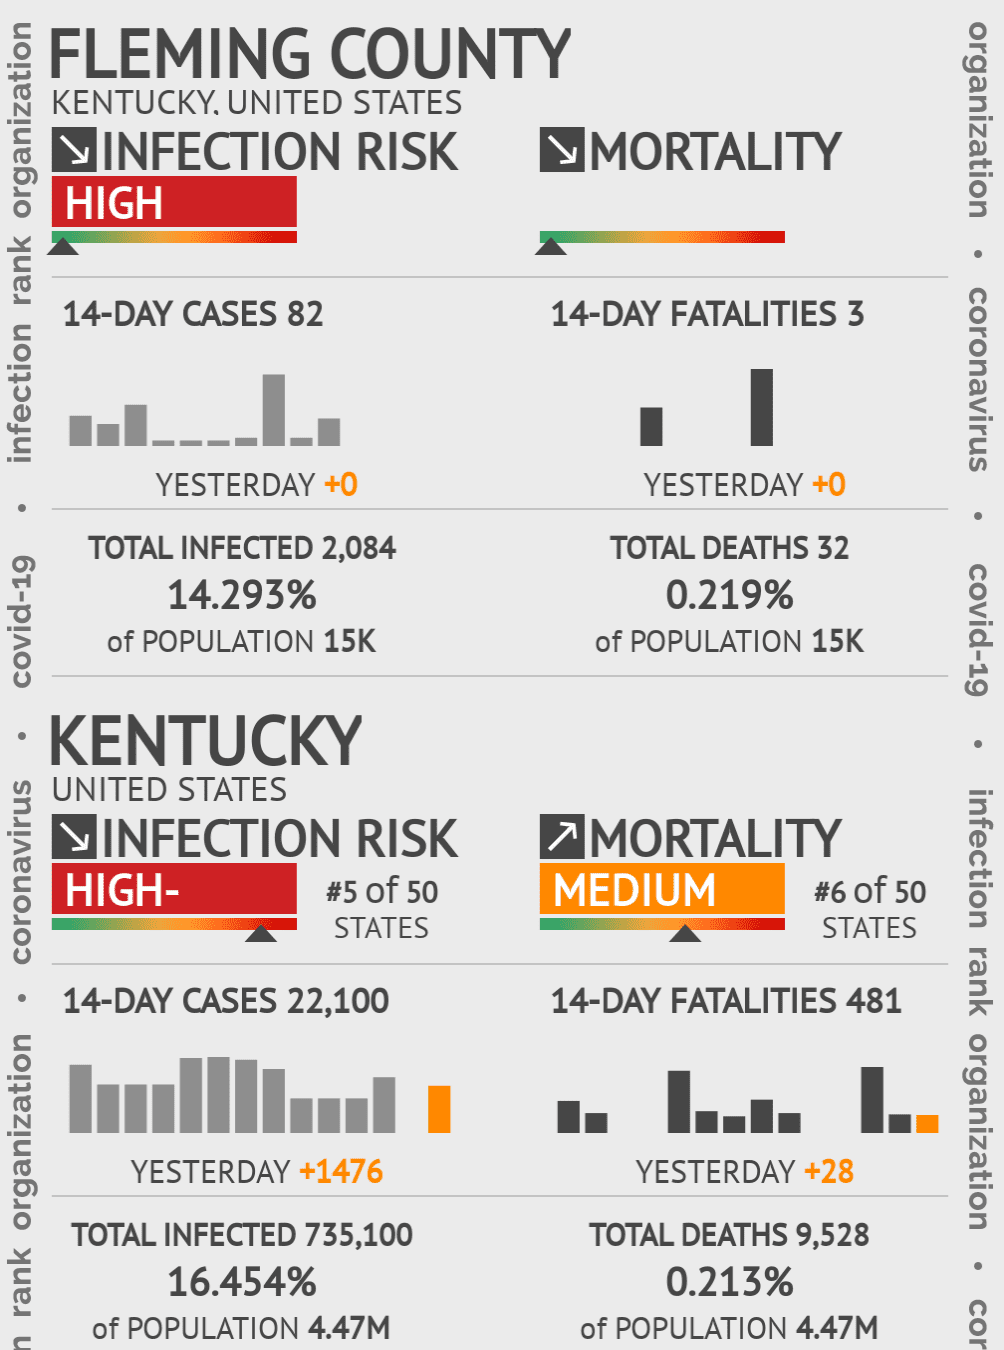 Fleming County Coronavirus Covid-19 Risk of Infection on February 27, 2021